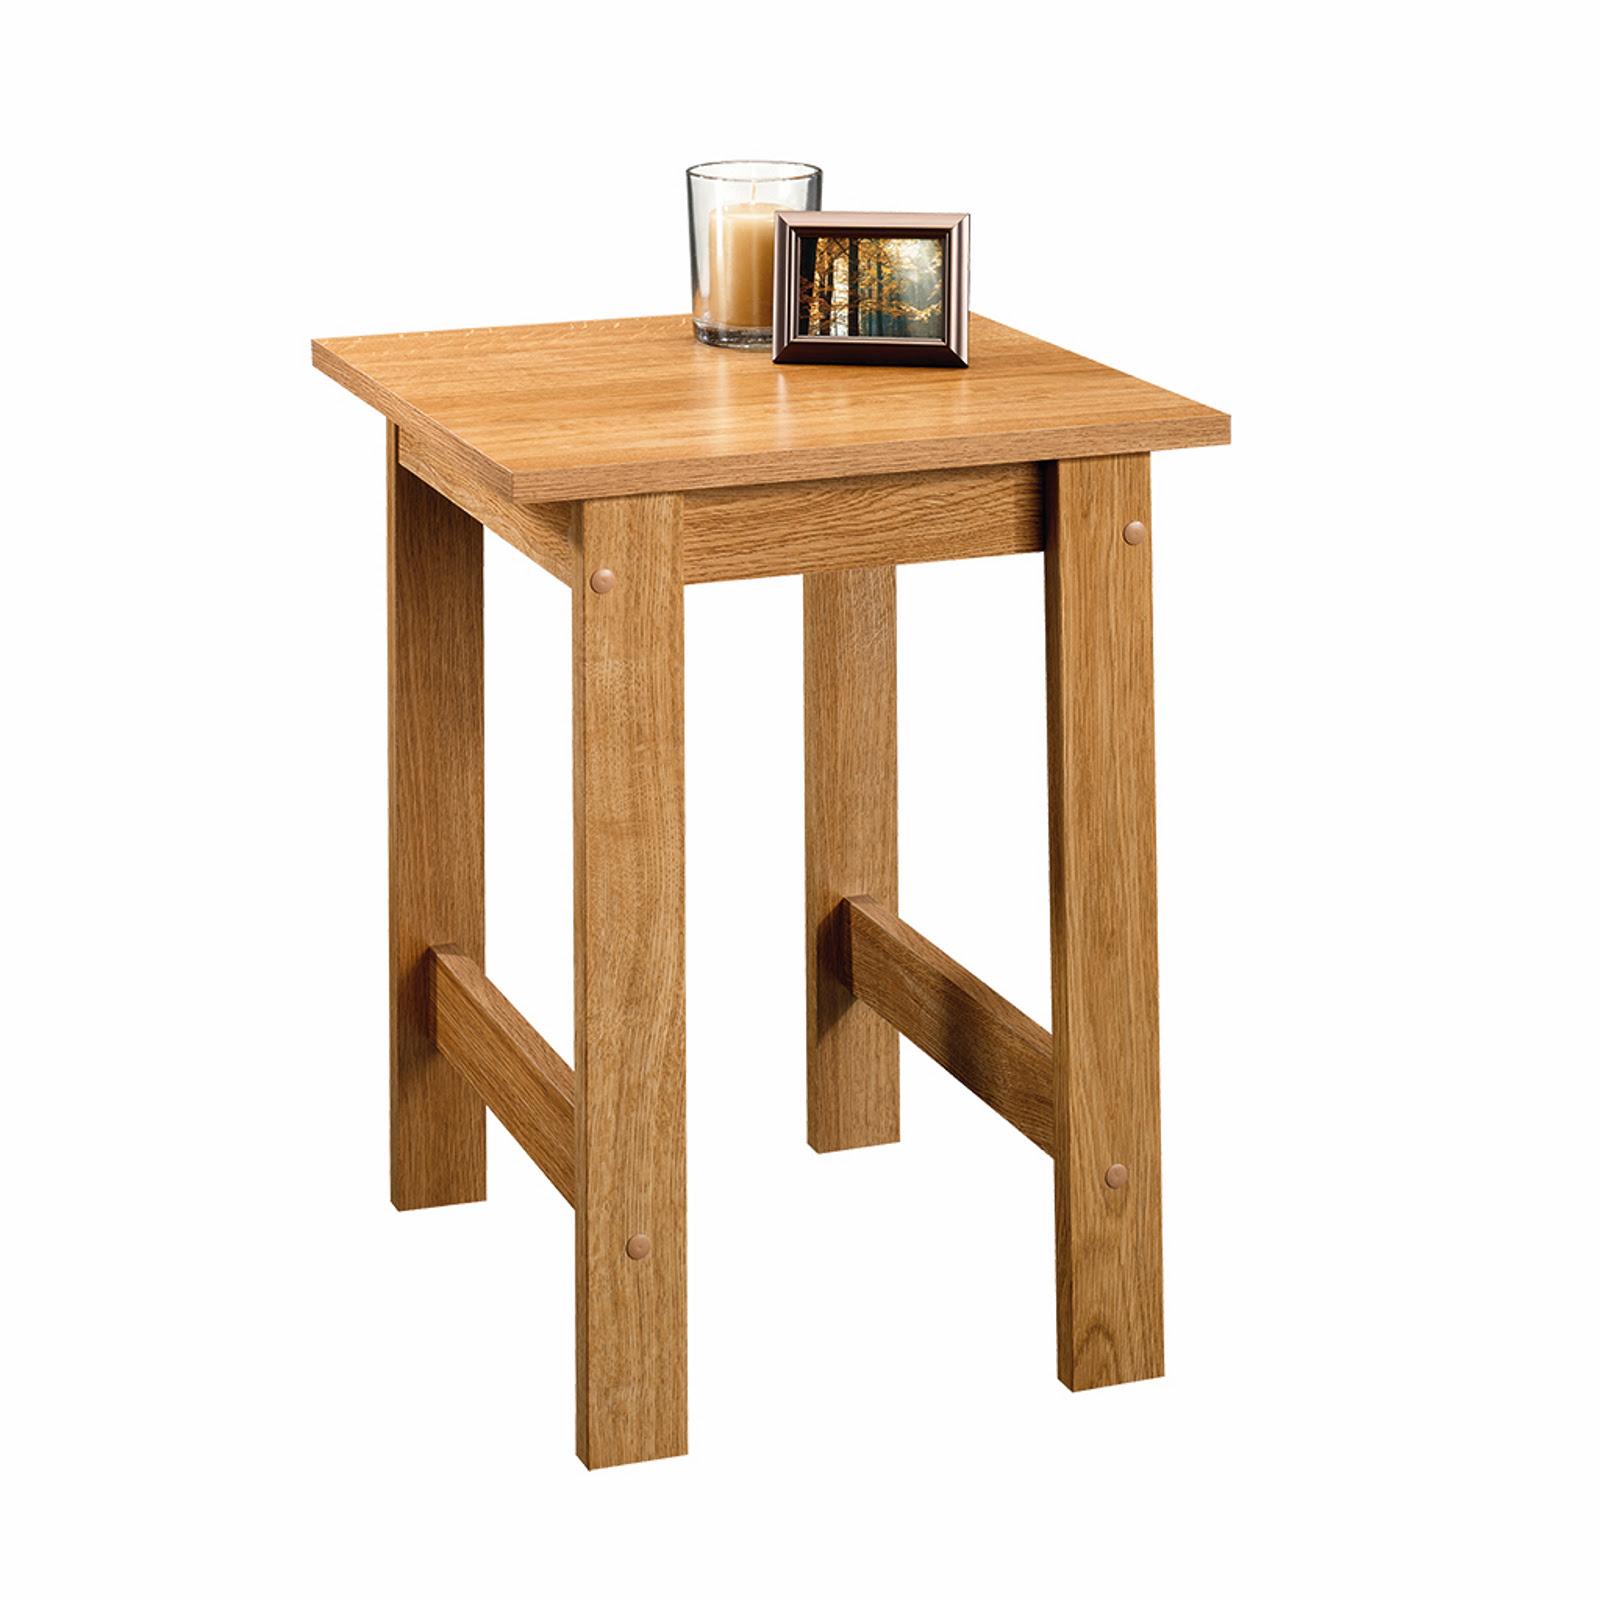 Sauder Beginnings Side Table - Highland Oak - Home ...